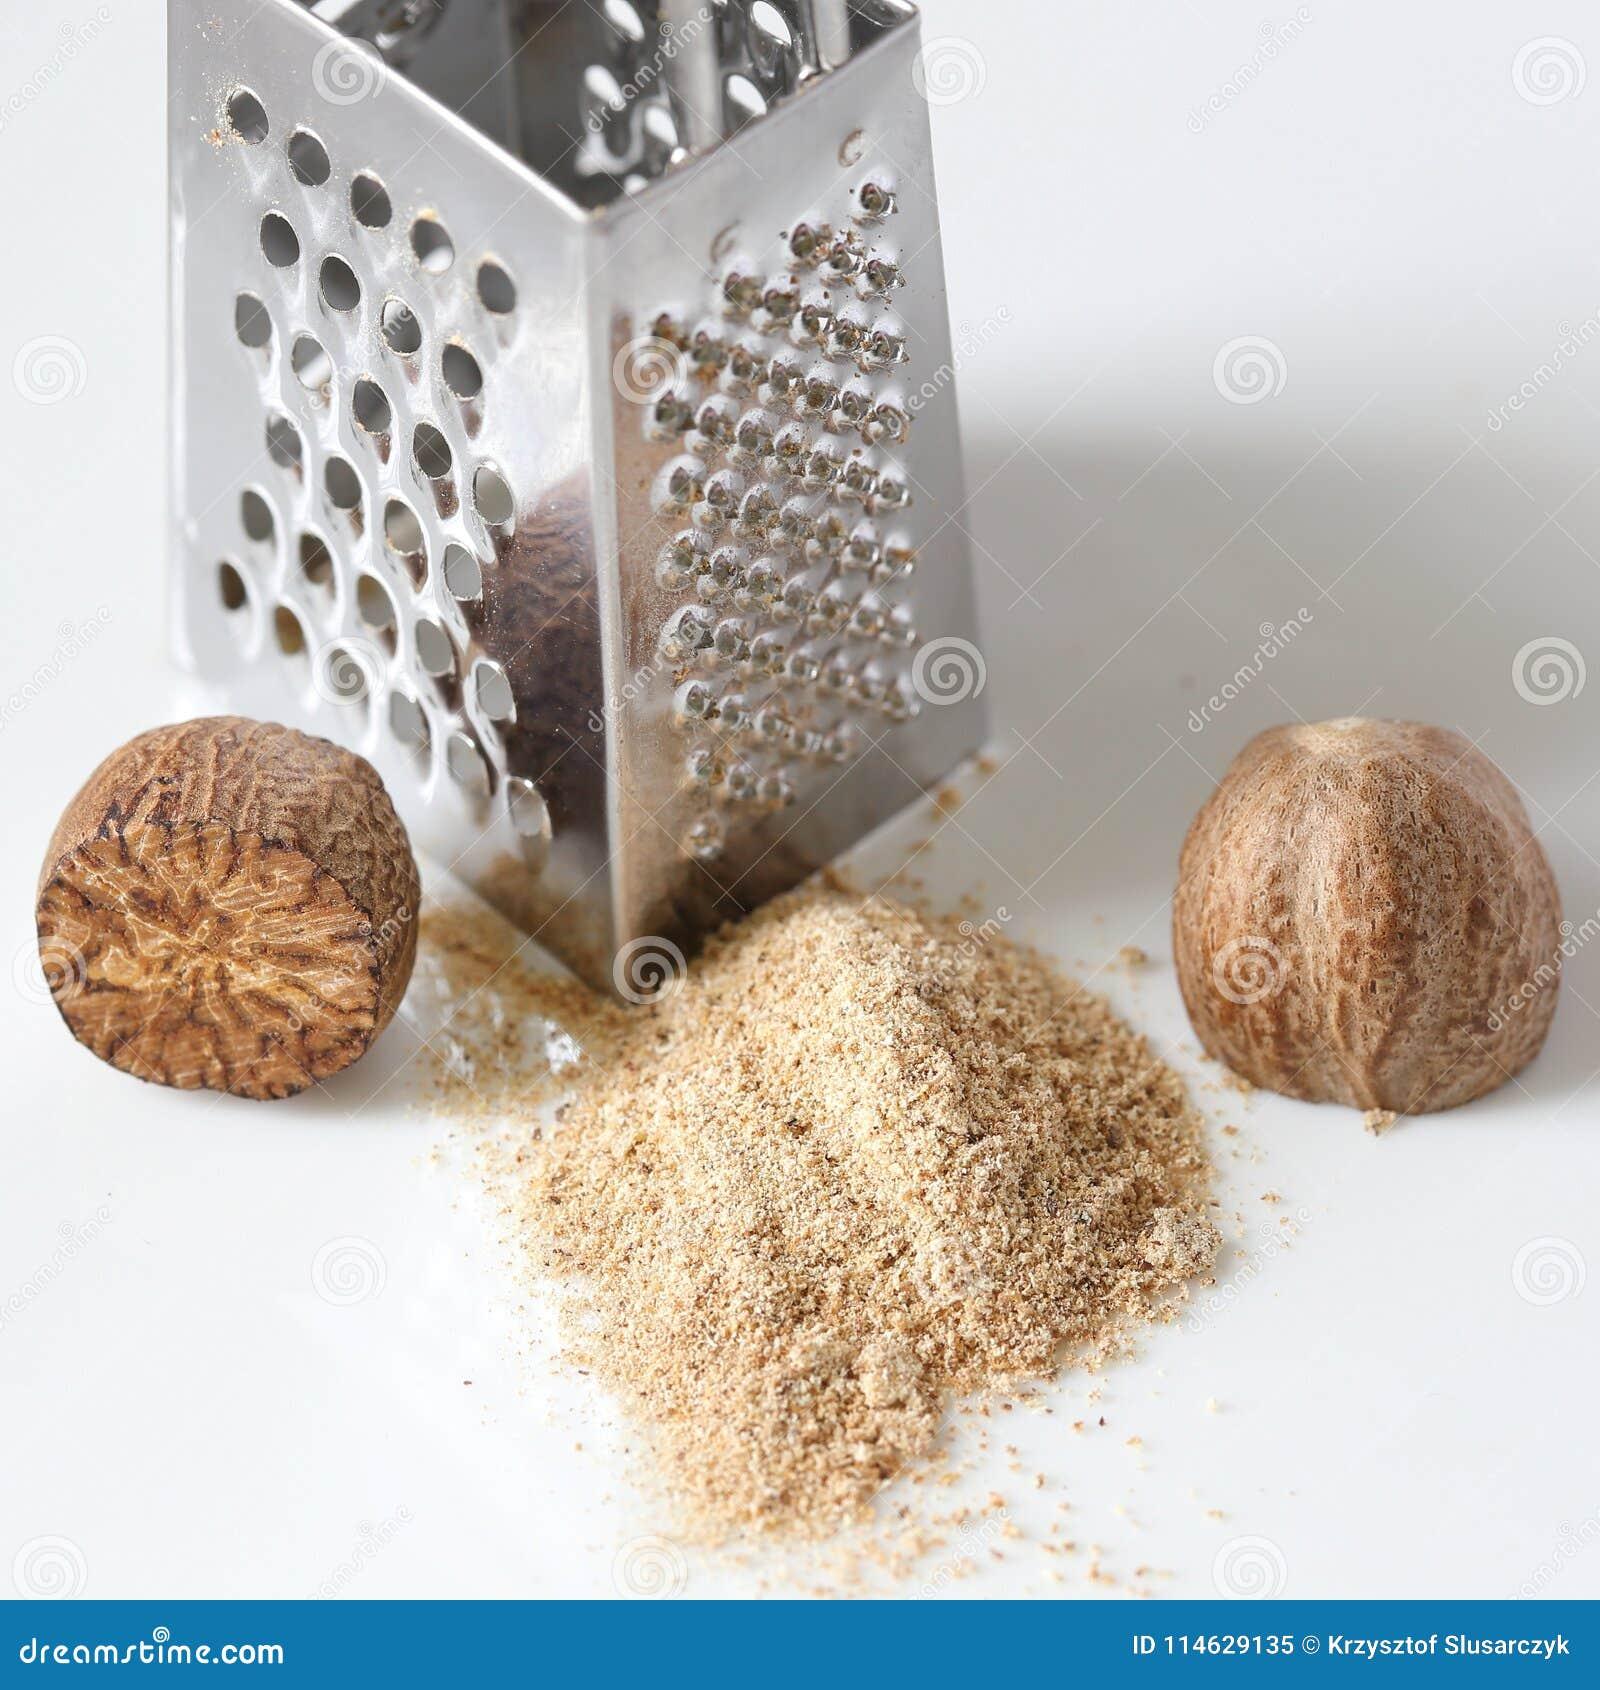 Nutmegged